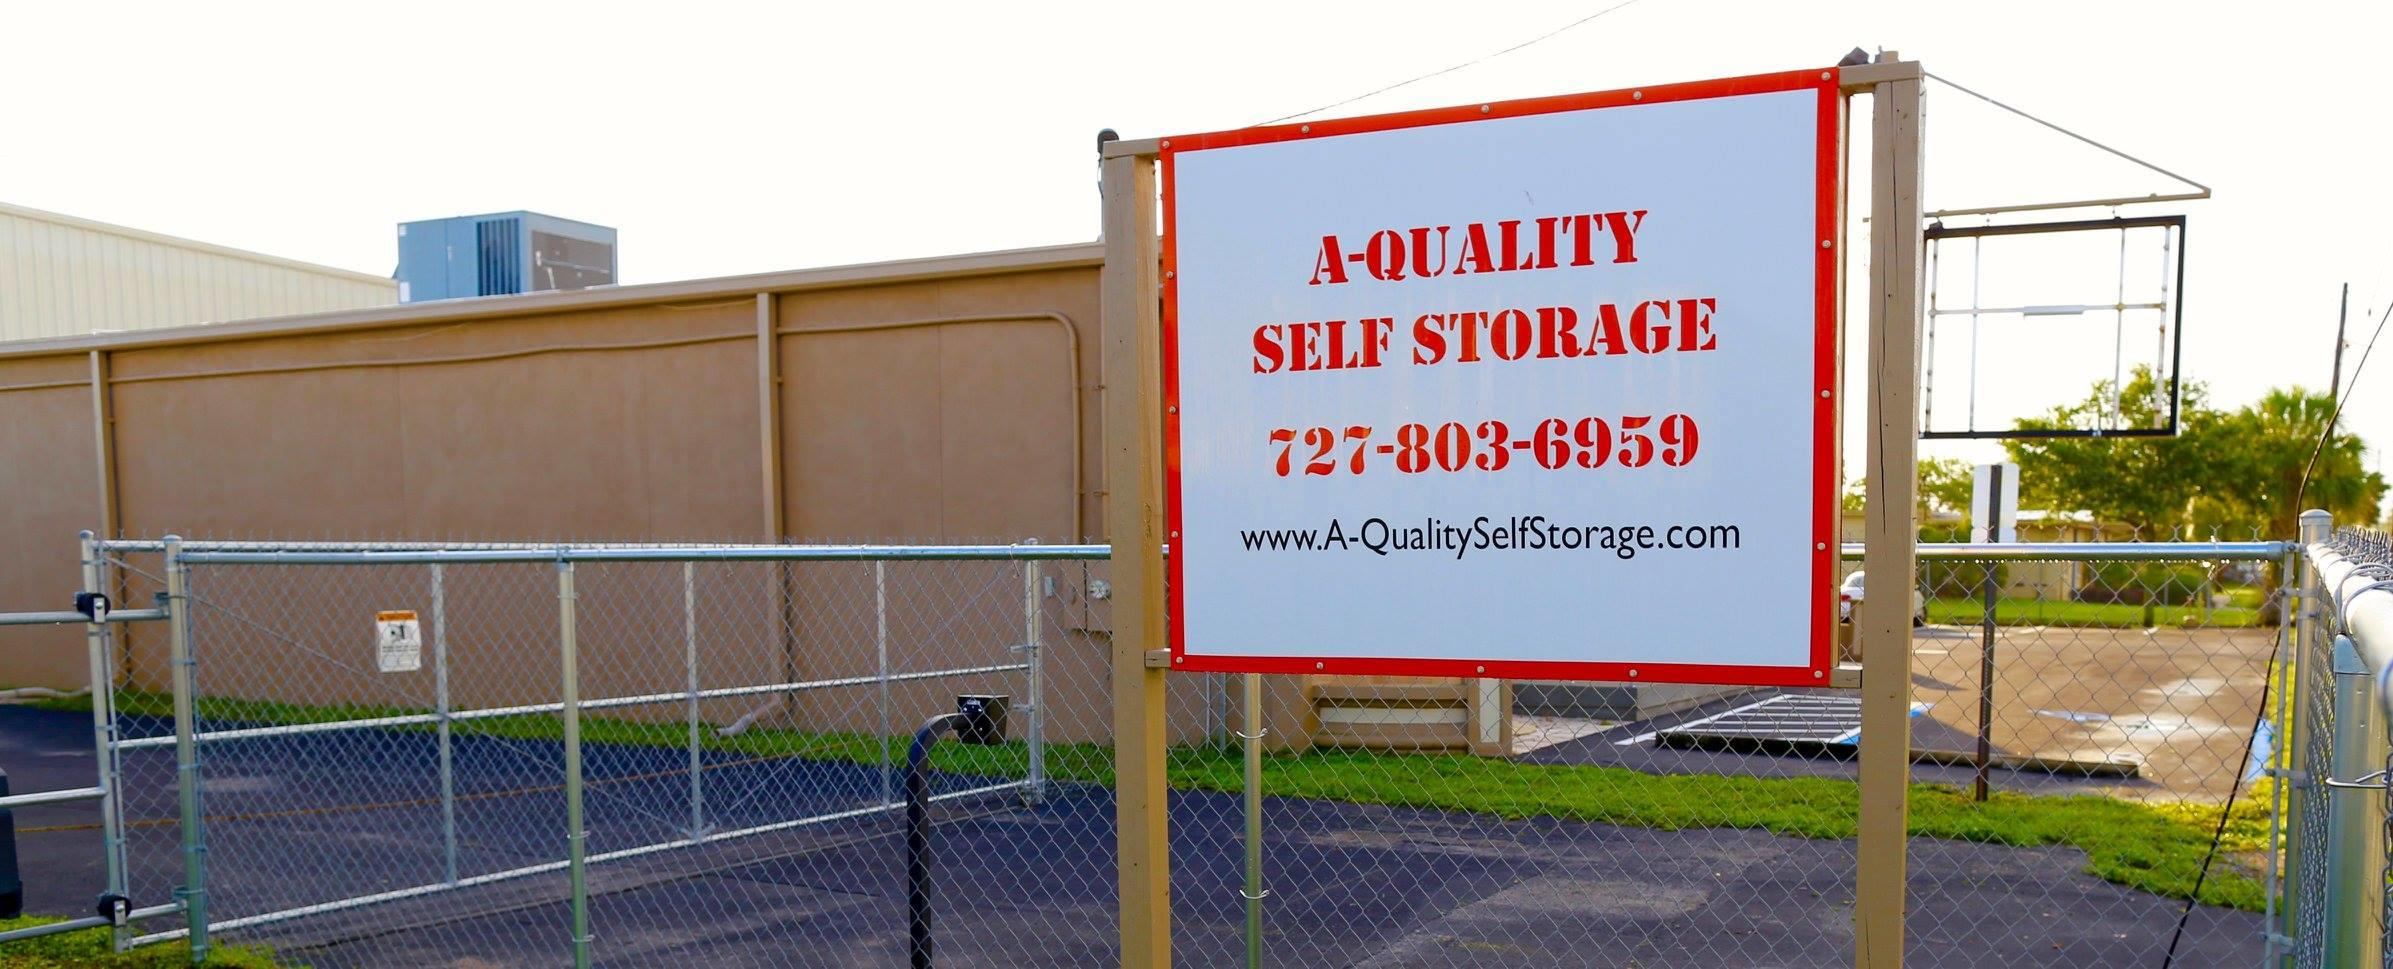 A-Quality Self Storage image 1